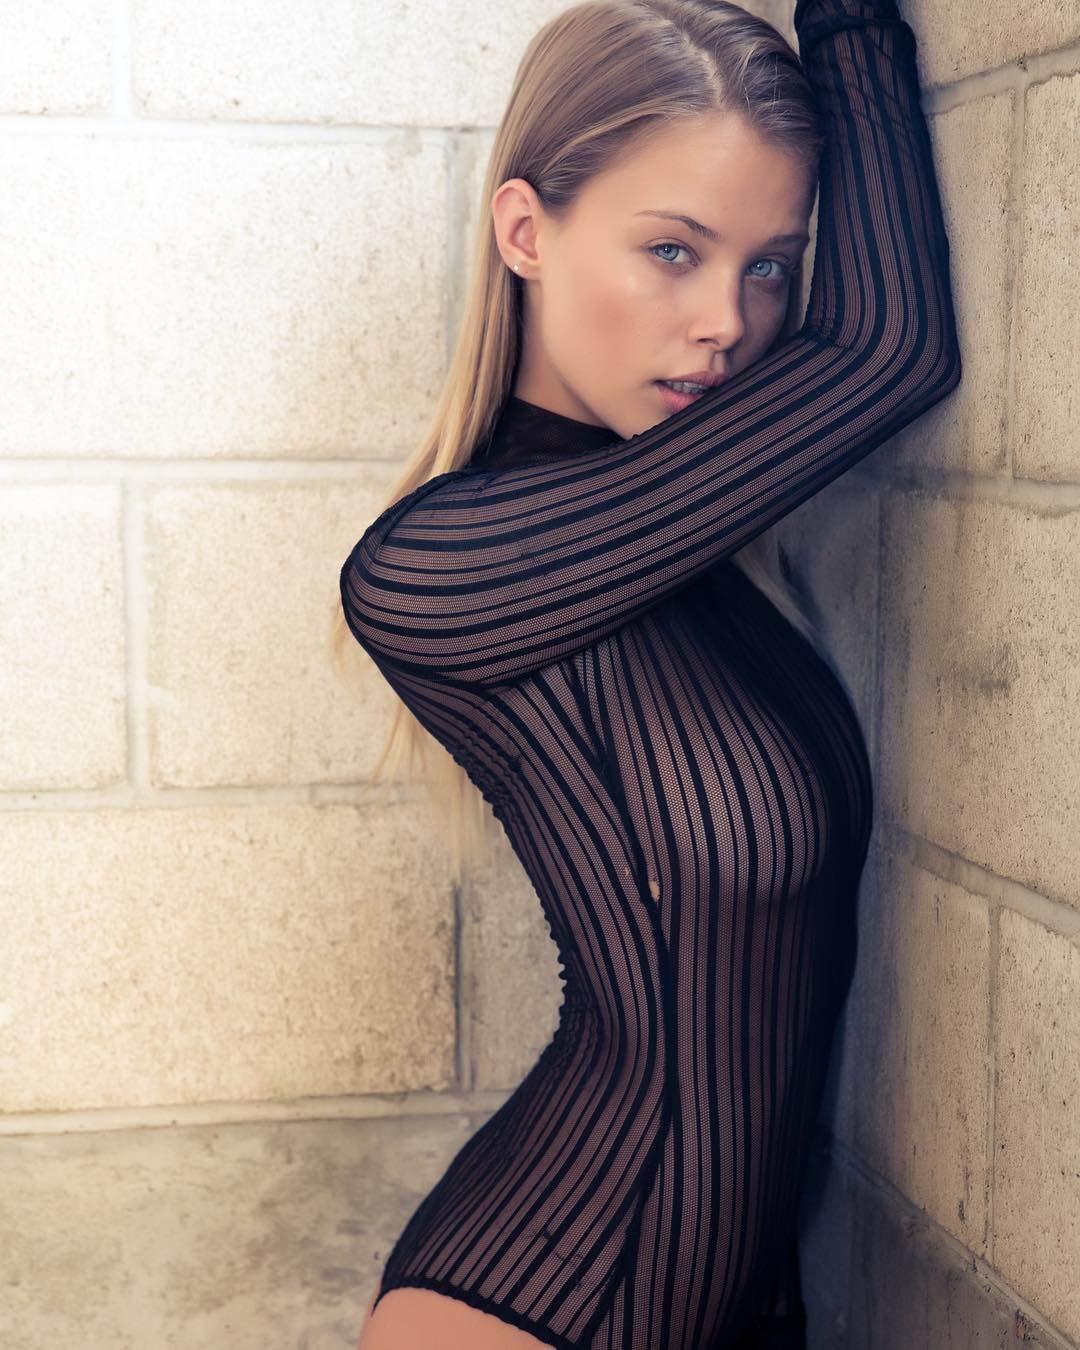 Model Lora